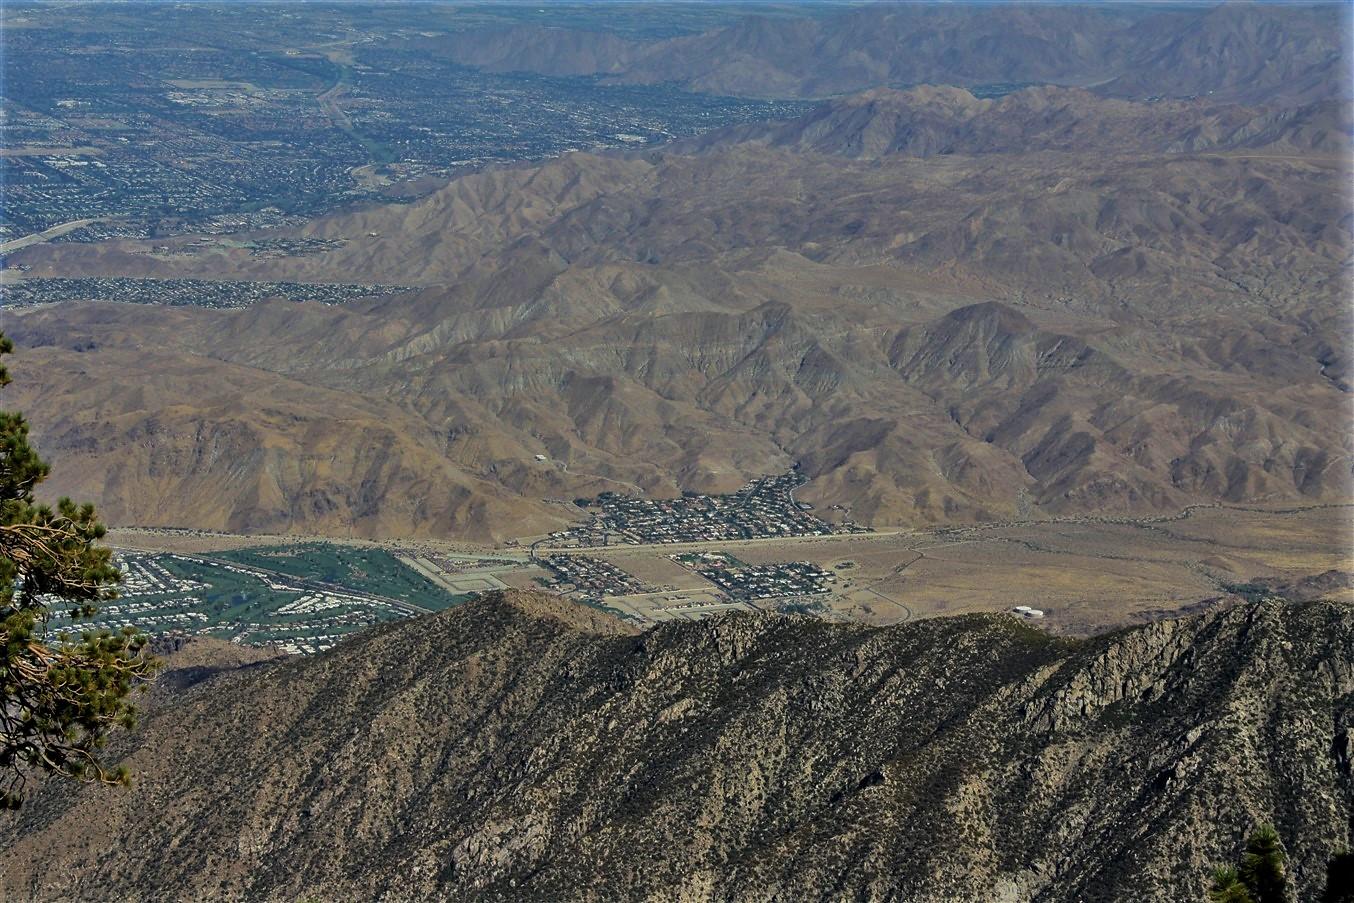 2009 08 24 78 Mt San Jacinto and Palm Springs Tram.jpg